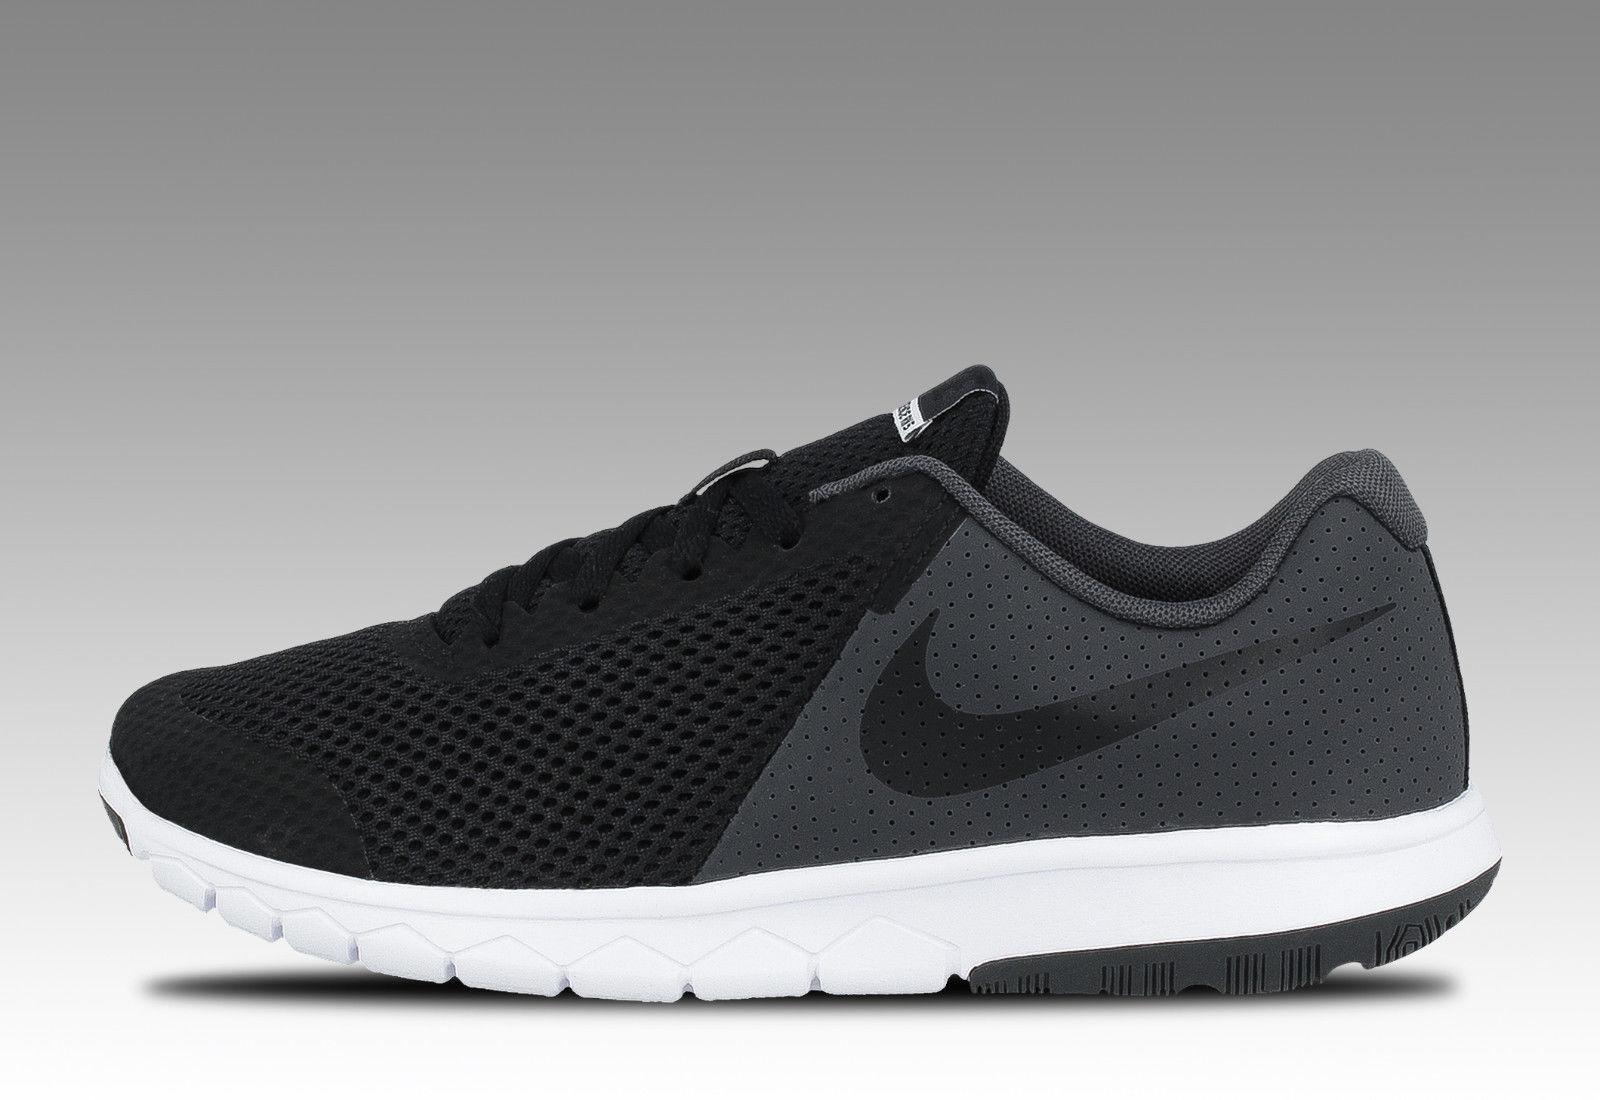 NEU Nike Flex Experience 5 Gr.37,5 Lauf- Schuhe Turnschuhe Sport schwarz 844995 001